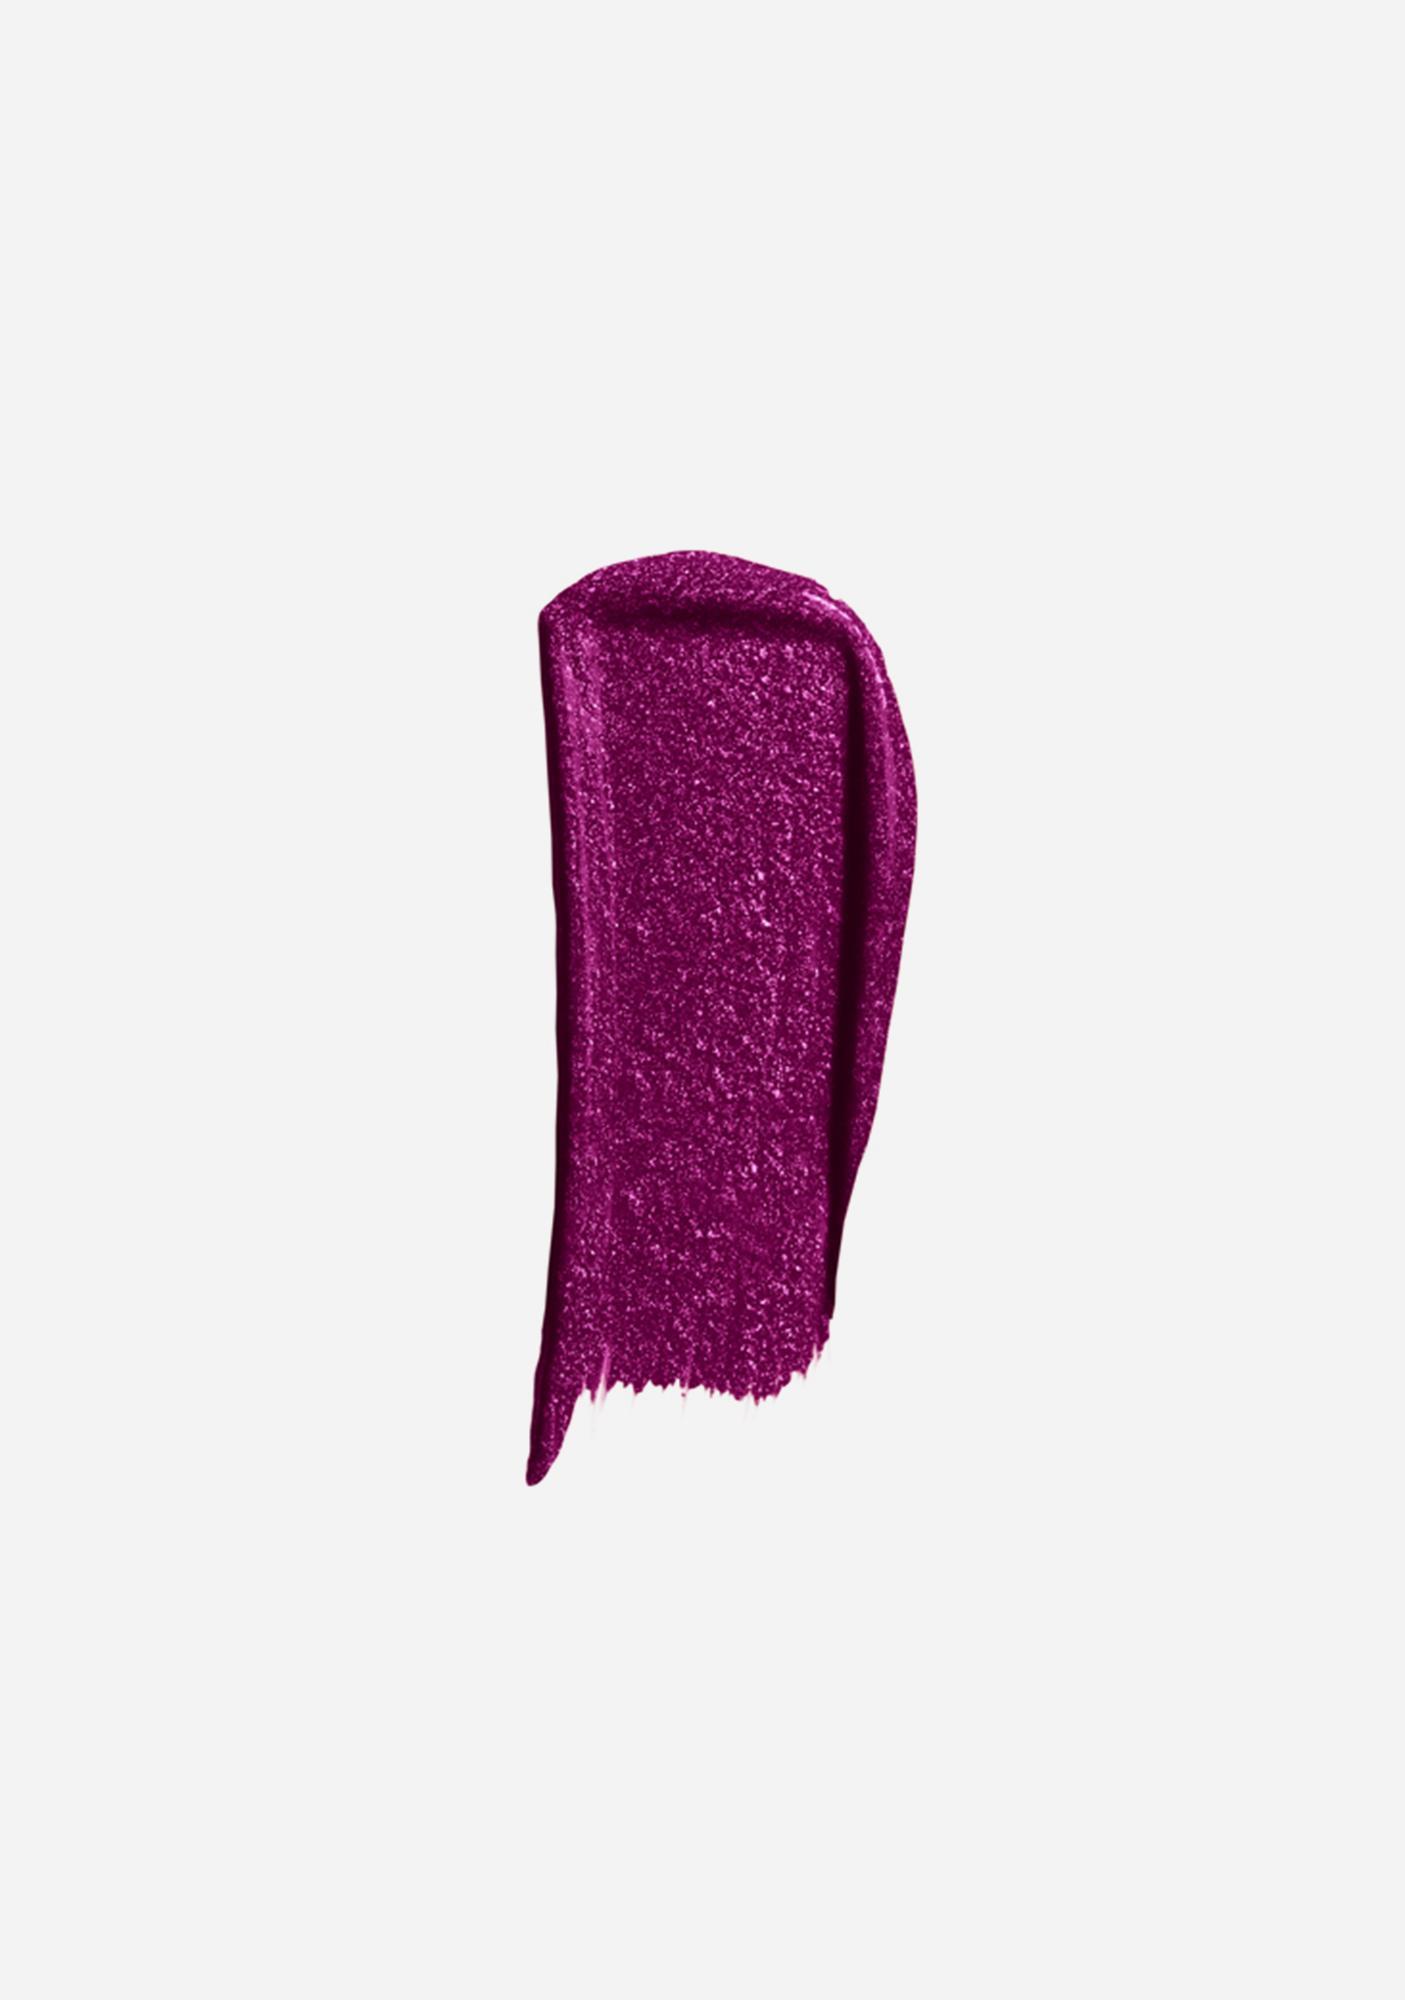 NYX Professional Makeup X Infinity Glitter Goals Liquid Lipstick